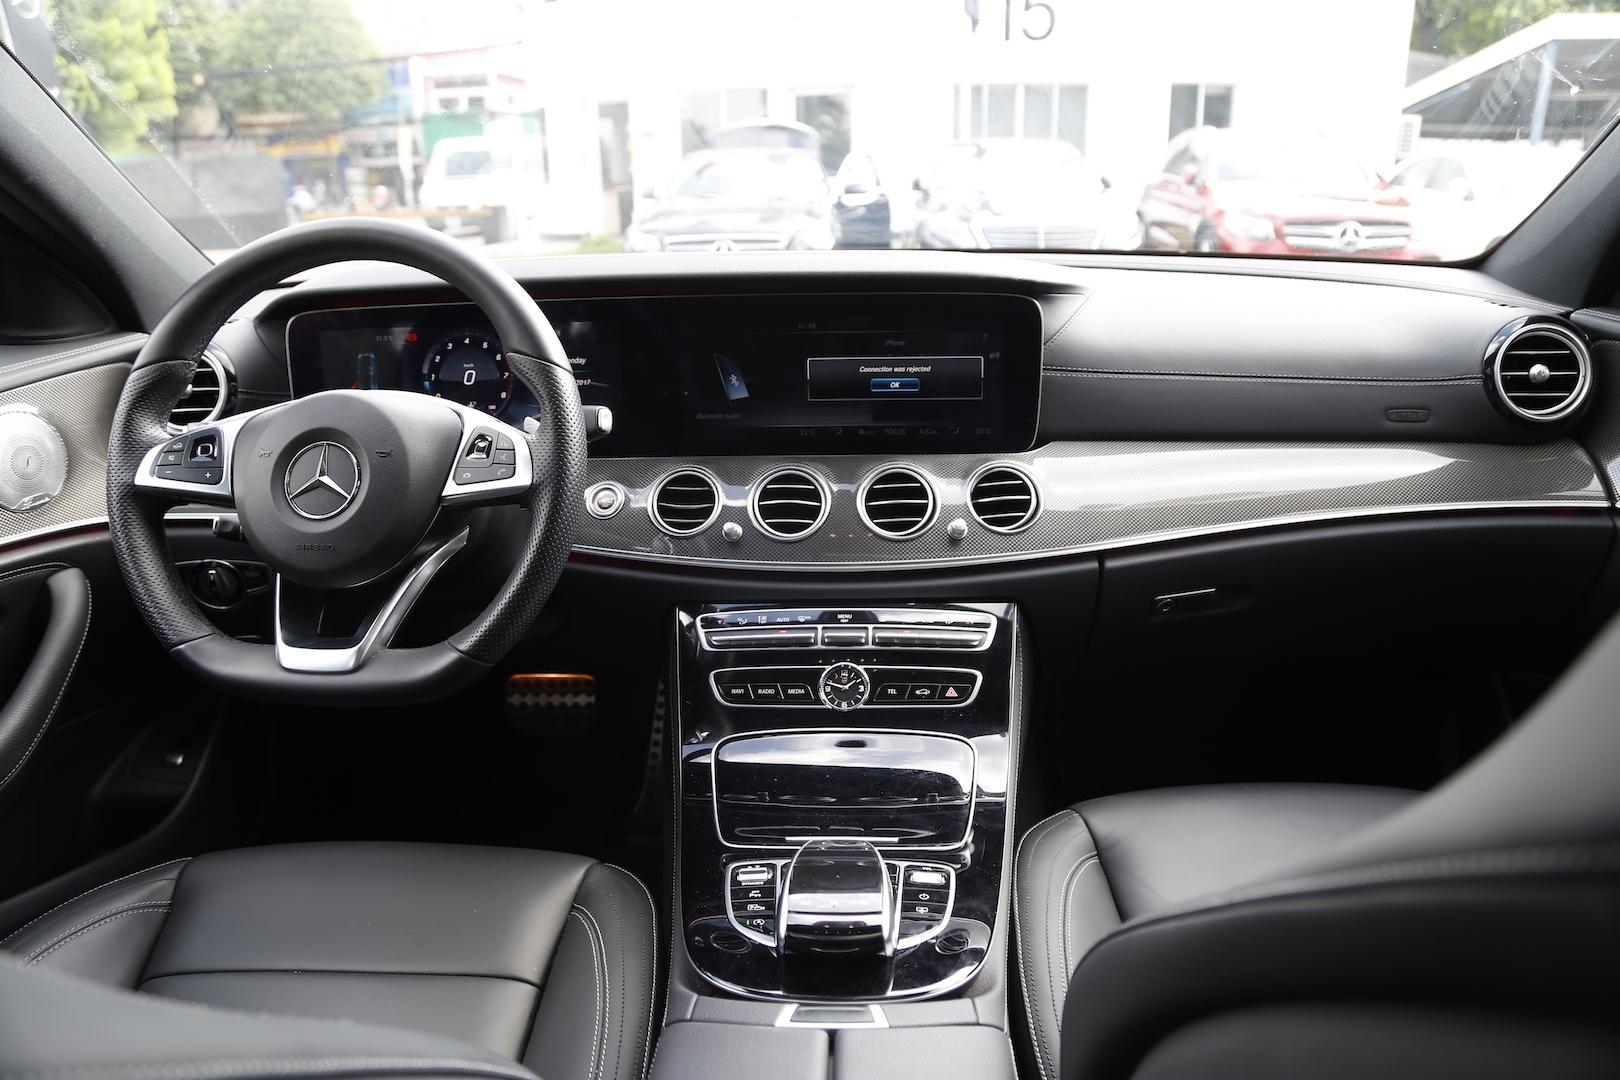 Danh gia Mercedes E300 AMG tai Viet Nam anh 12